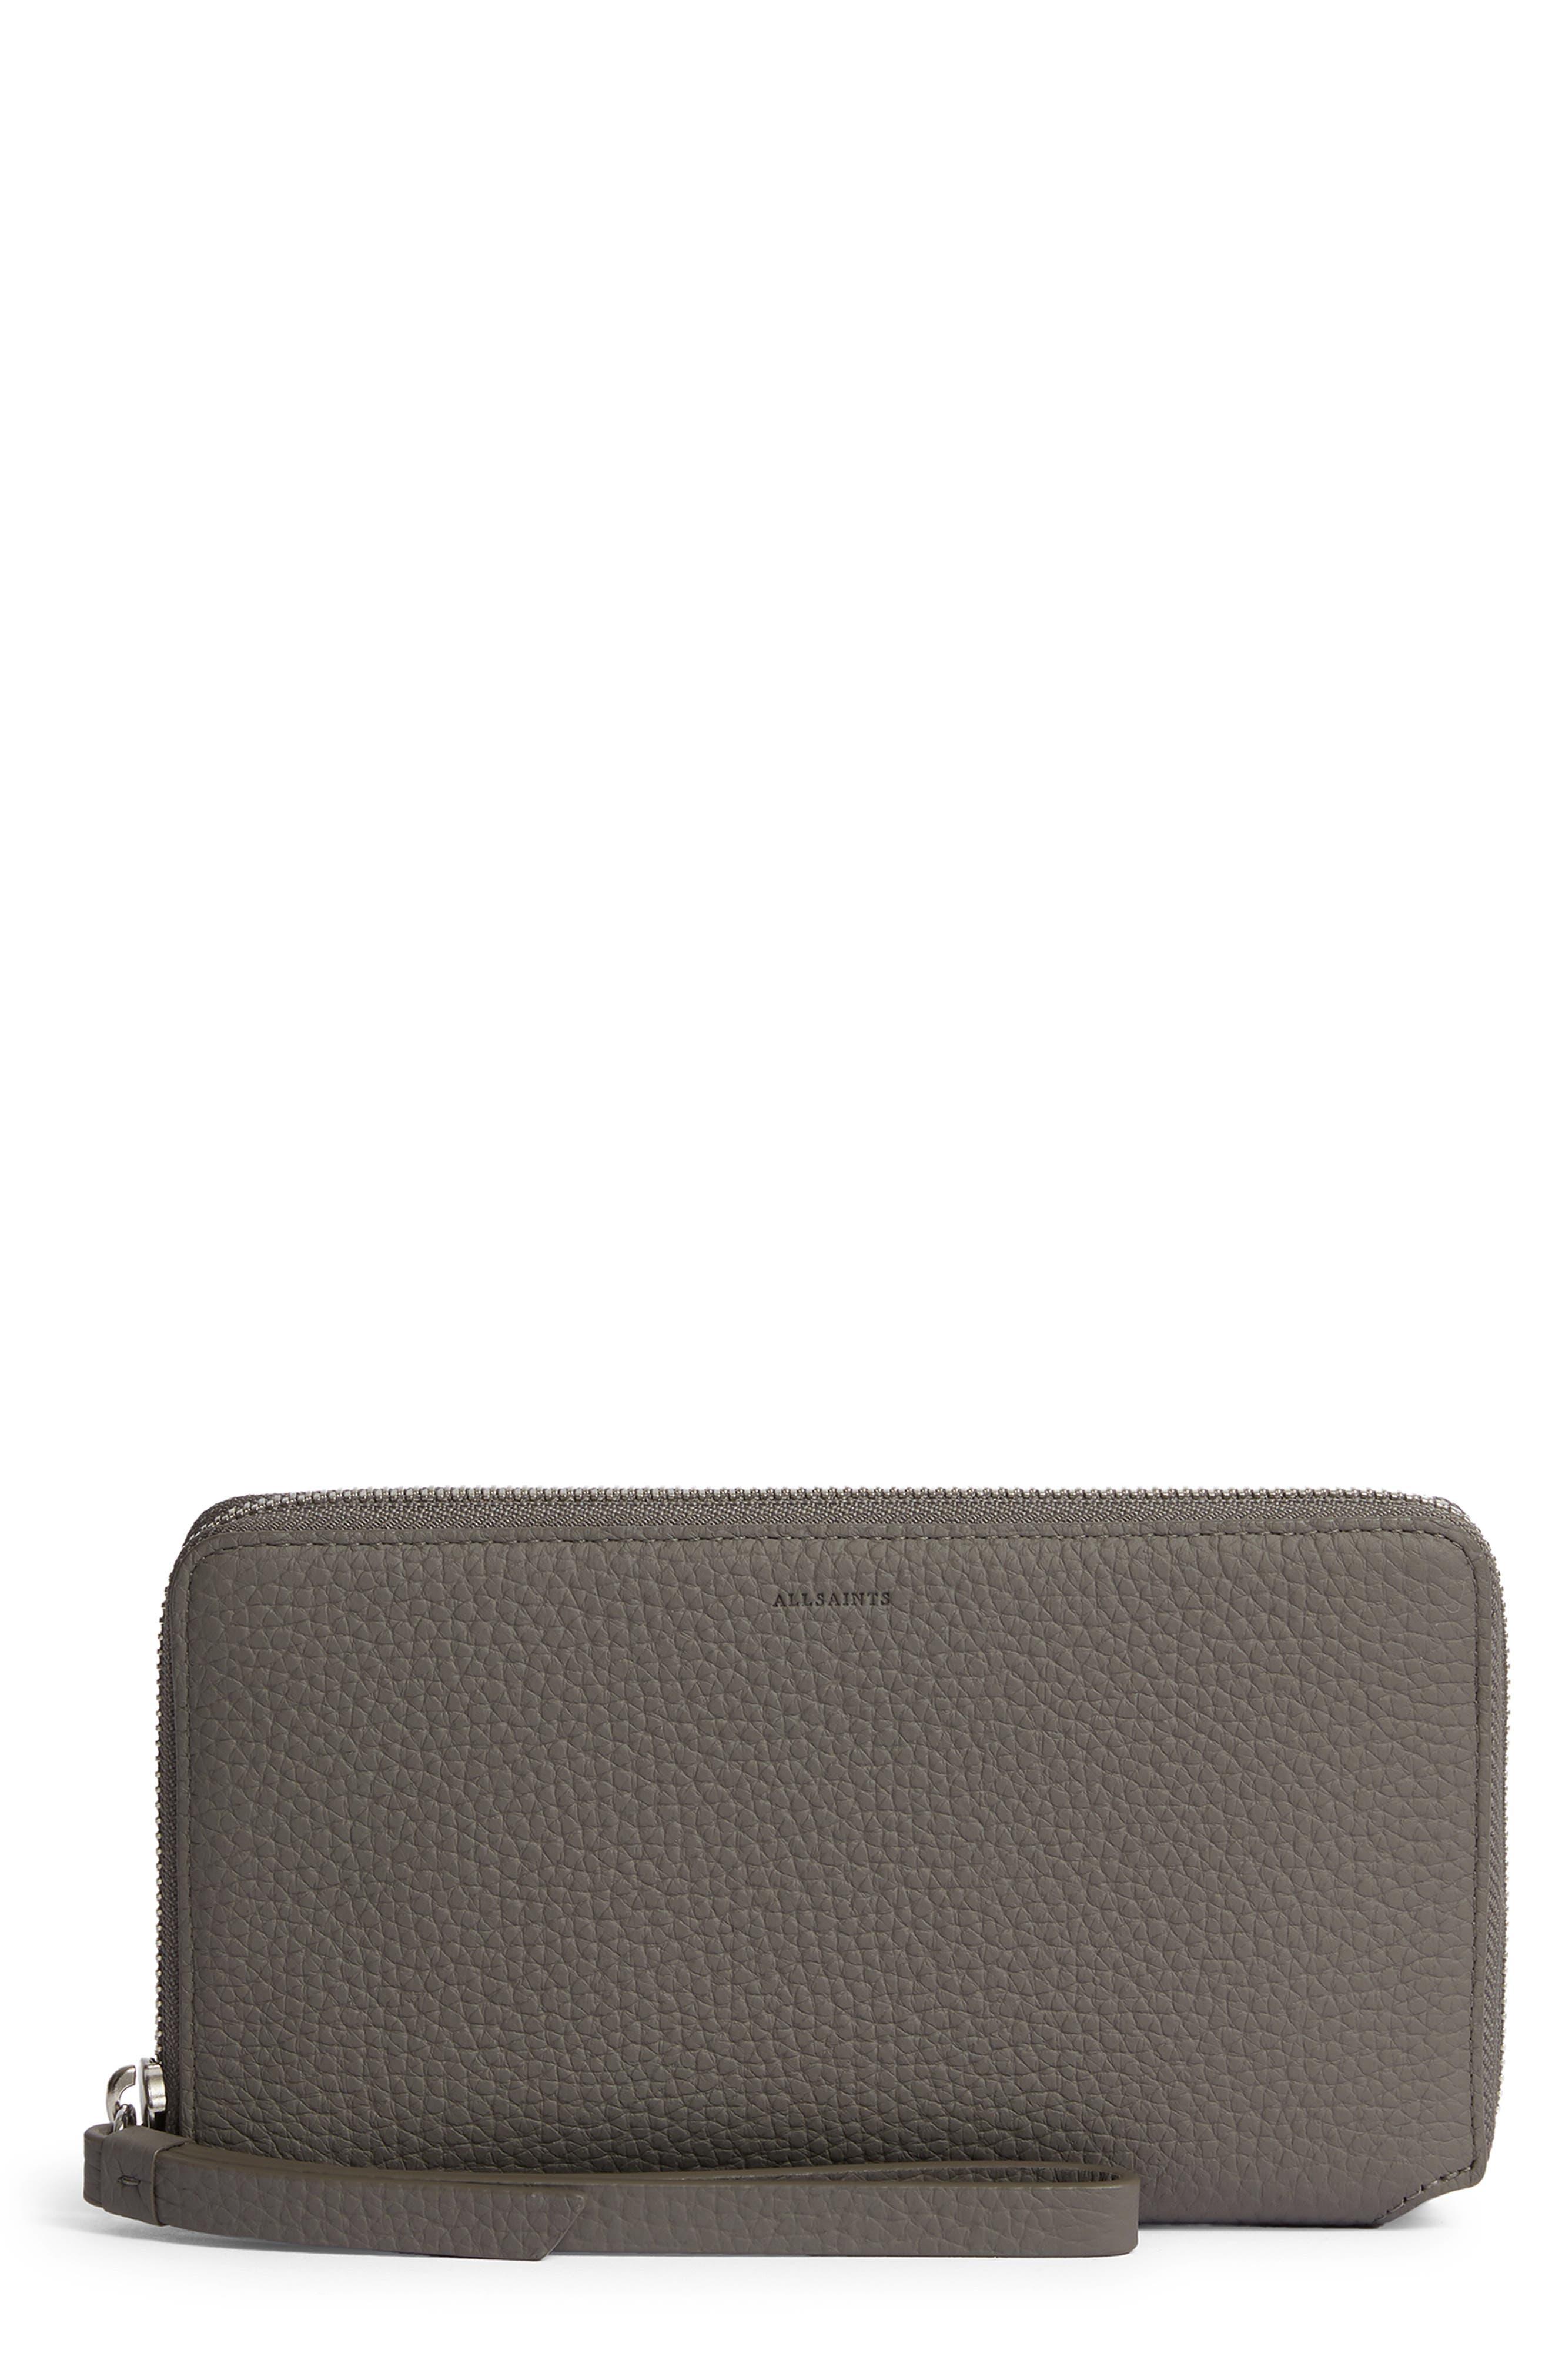 Fetch Leather Phone Wristlet,                             Main thumbnail 1, color,                             STORM GREY